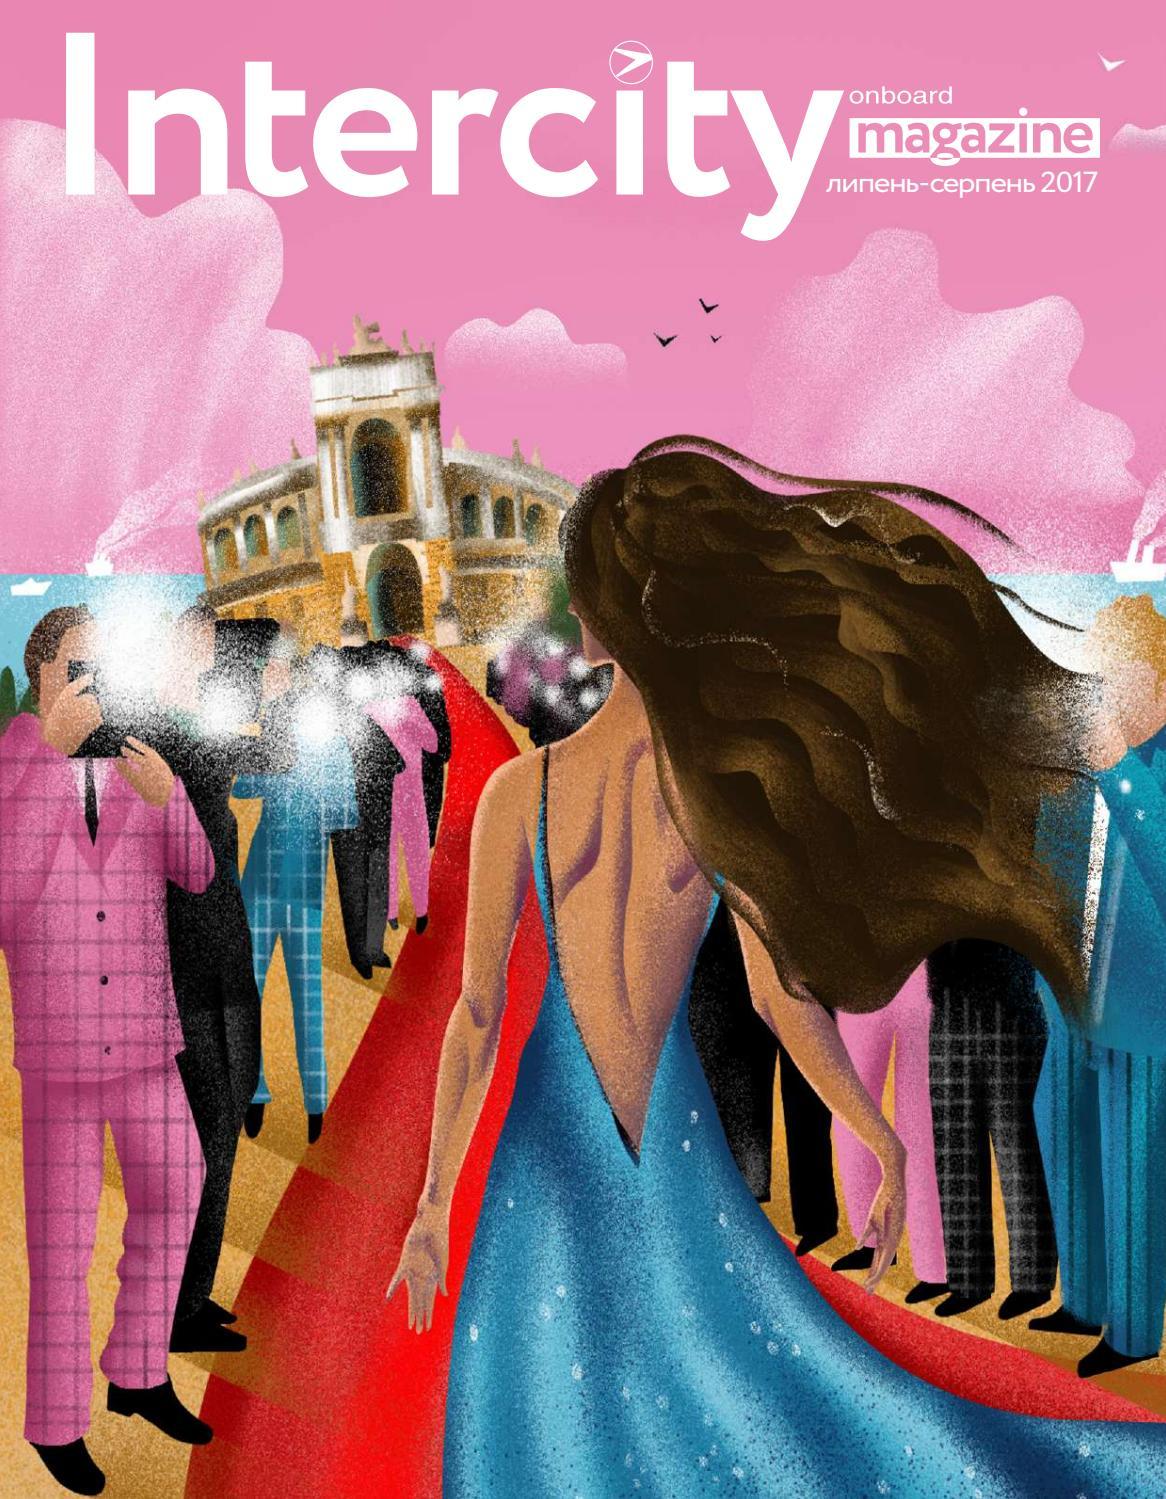 Intercity onboard magazine липень-серпень 2017 by ICOM - issuu 292ece737144d